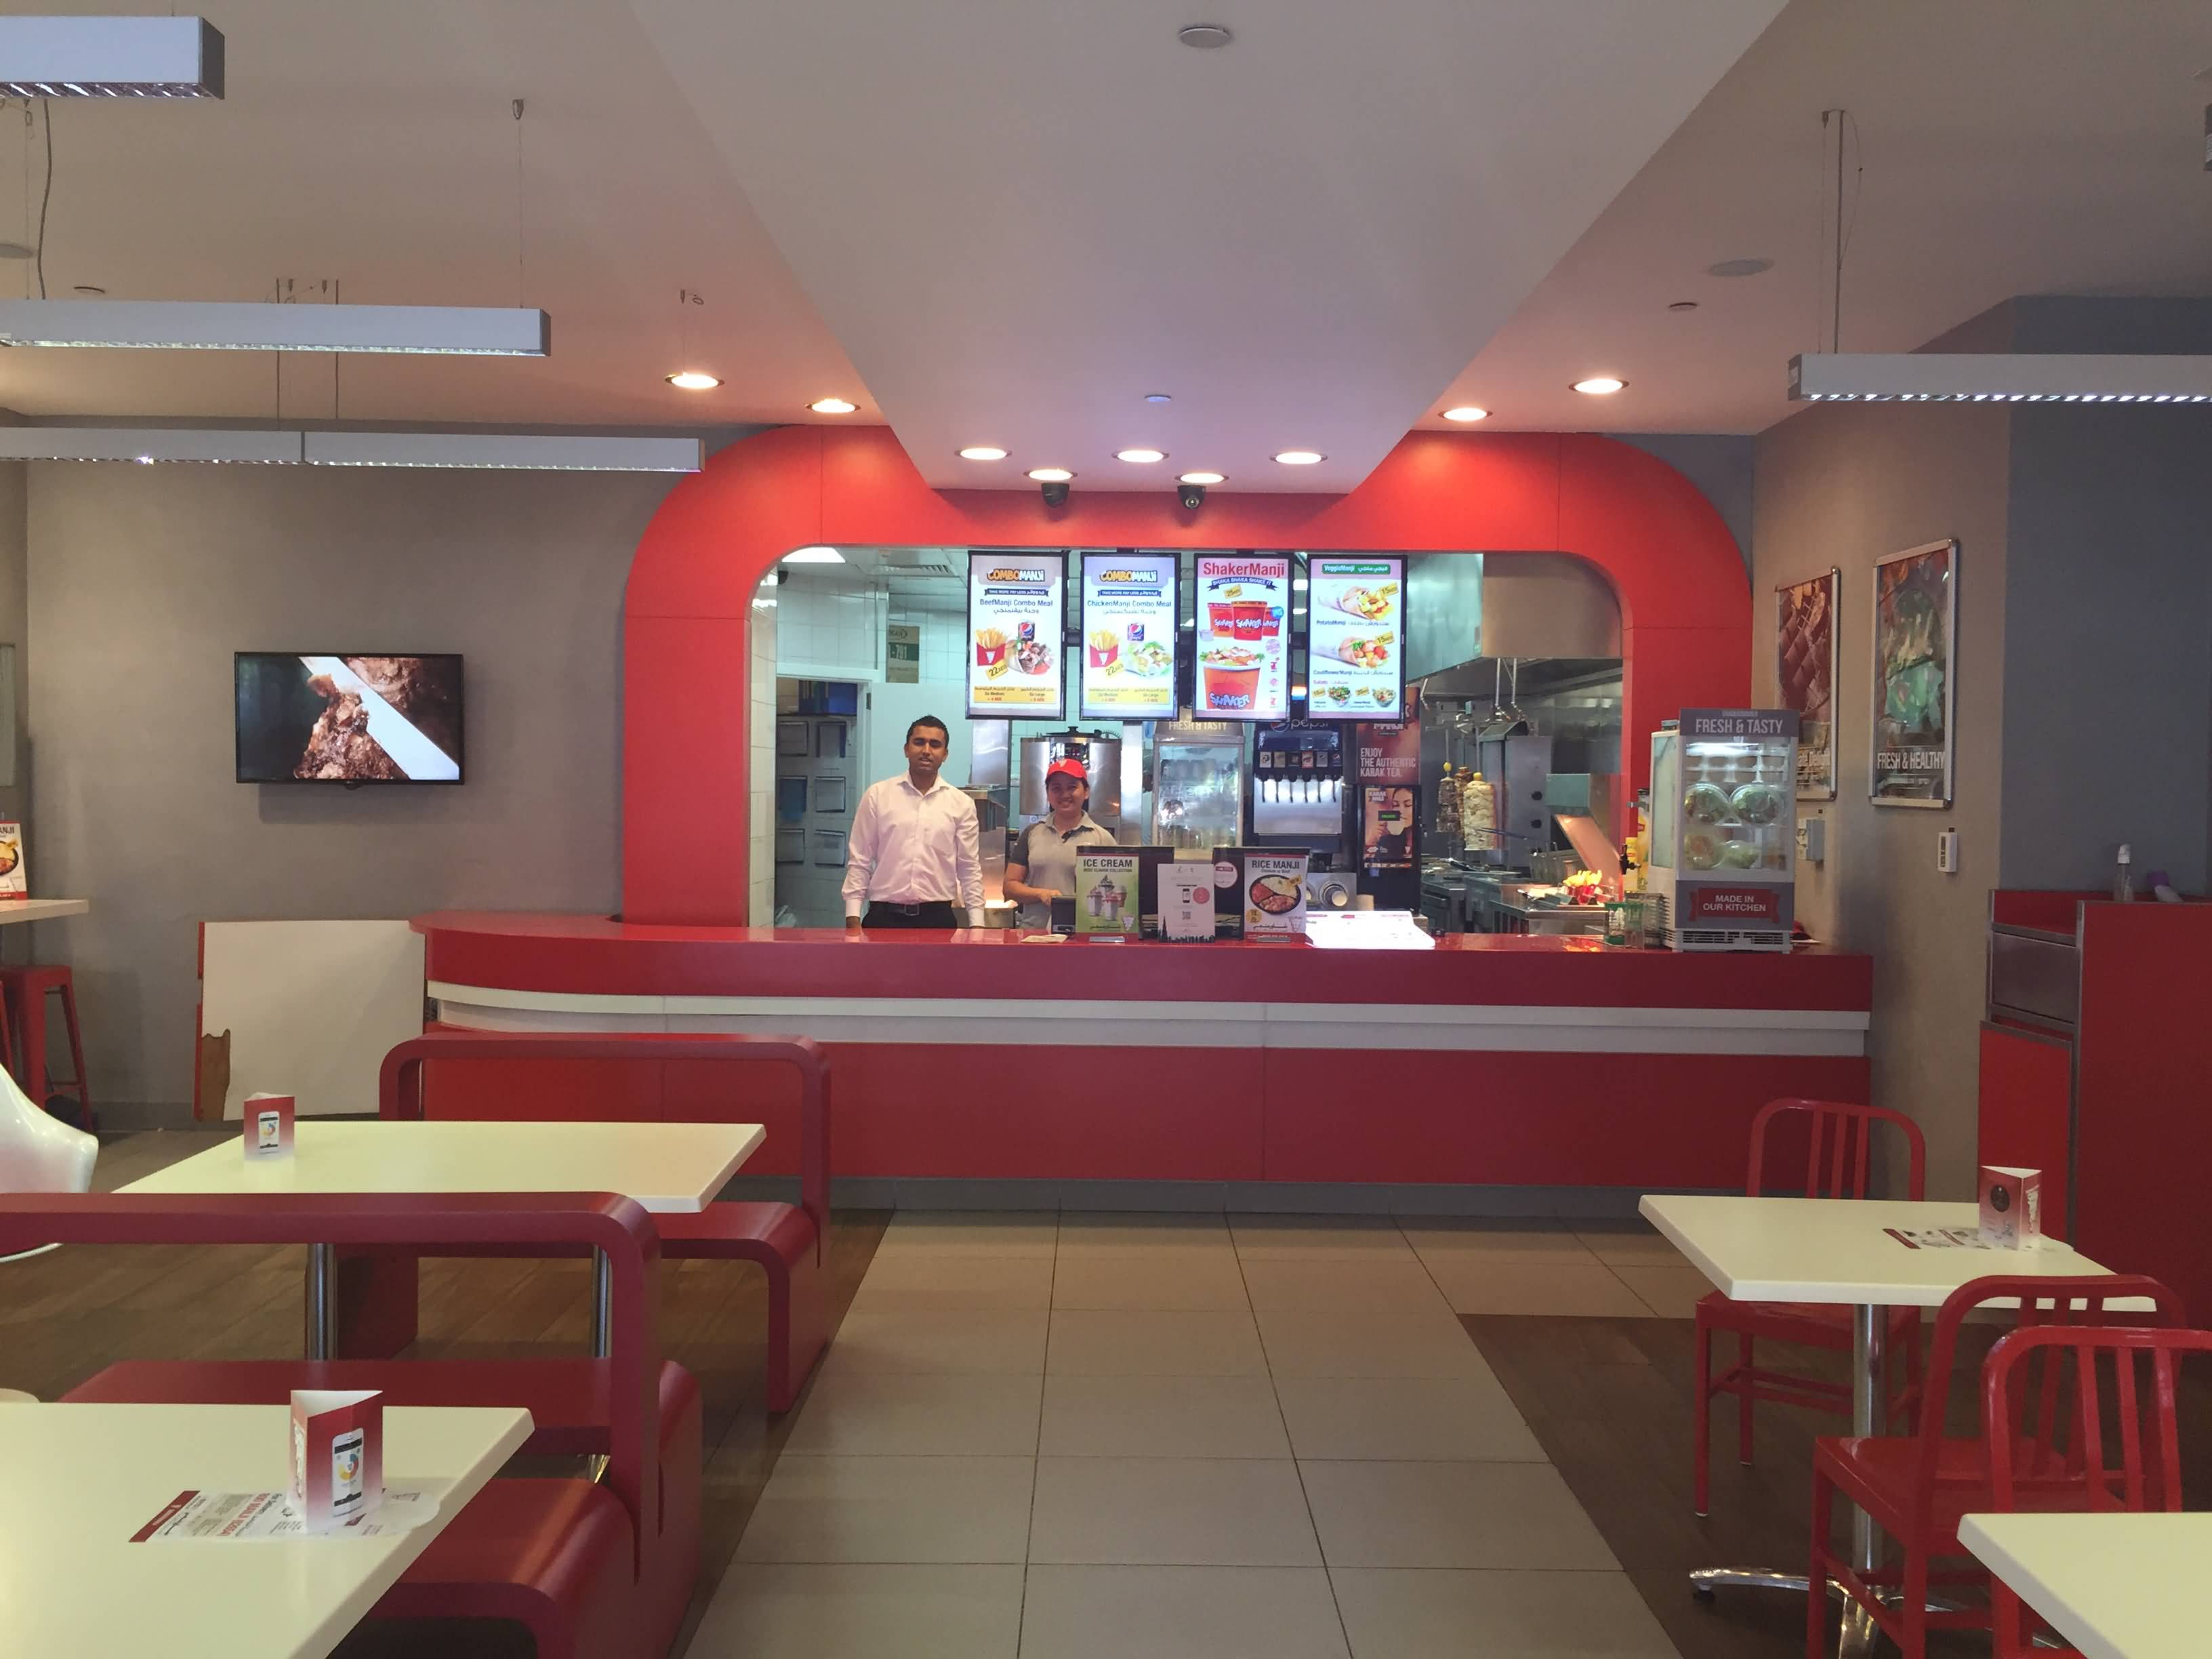 صورة مطعم شاورمانجي في دبي